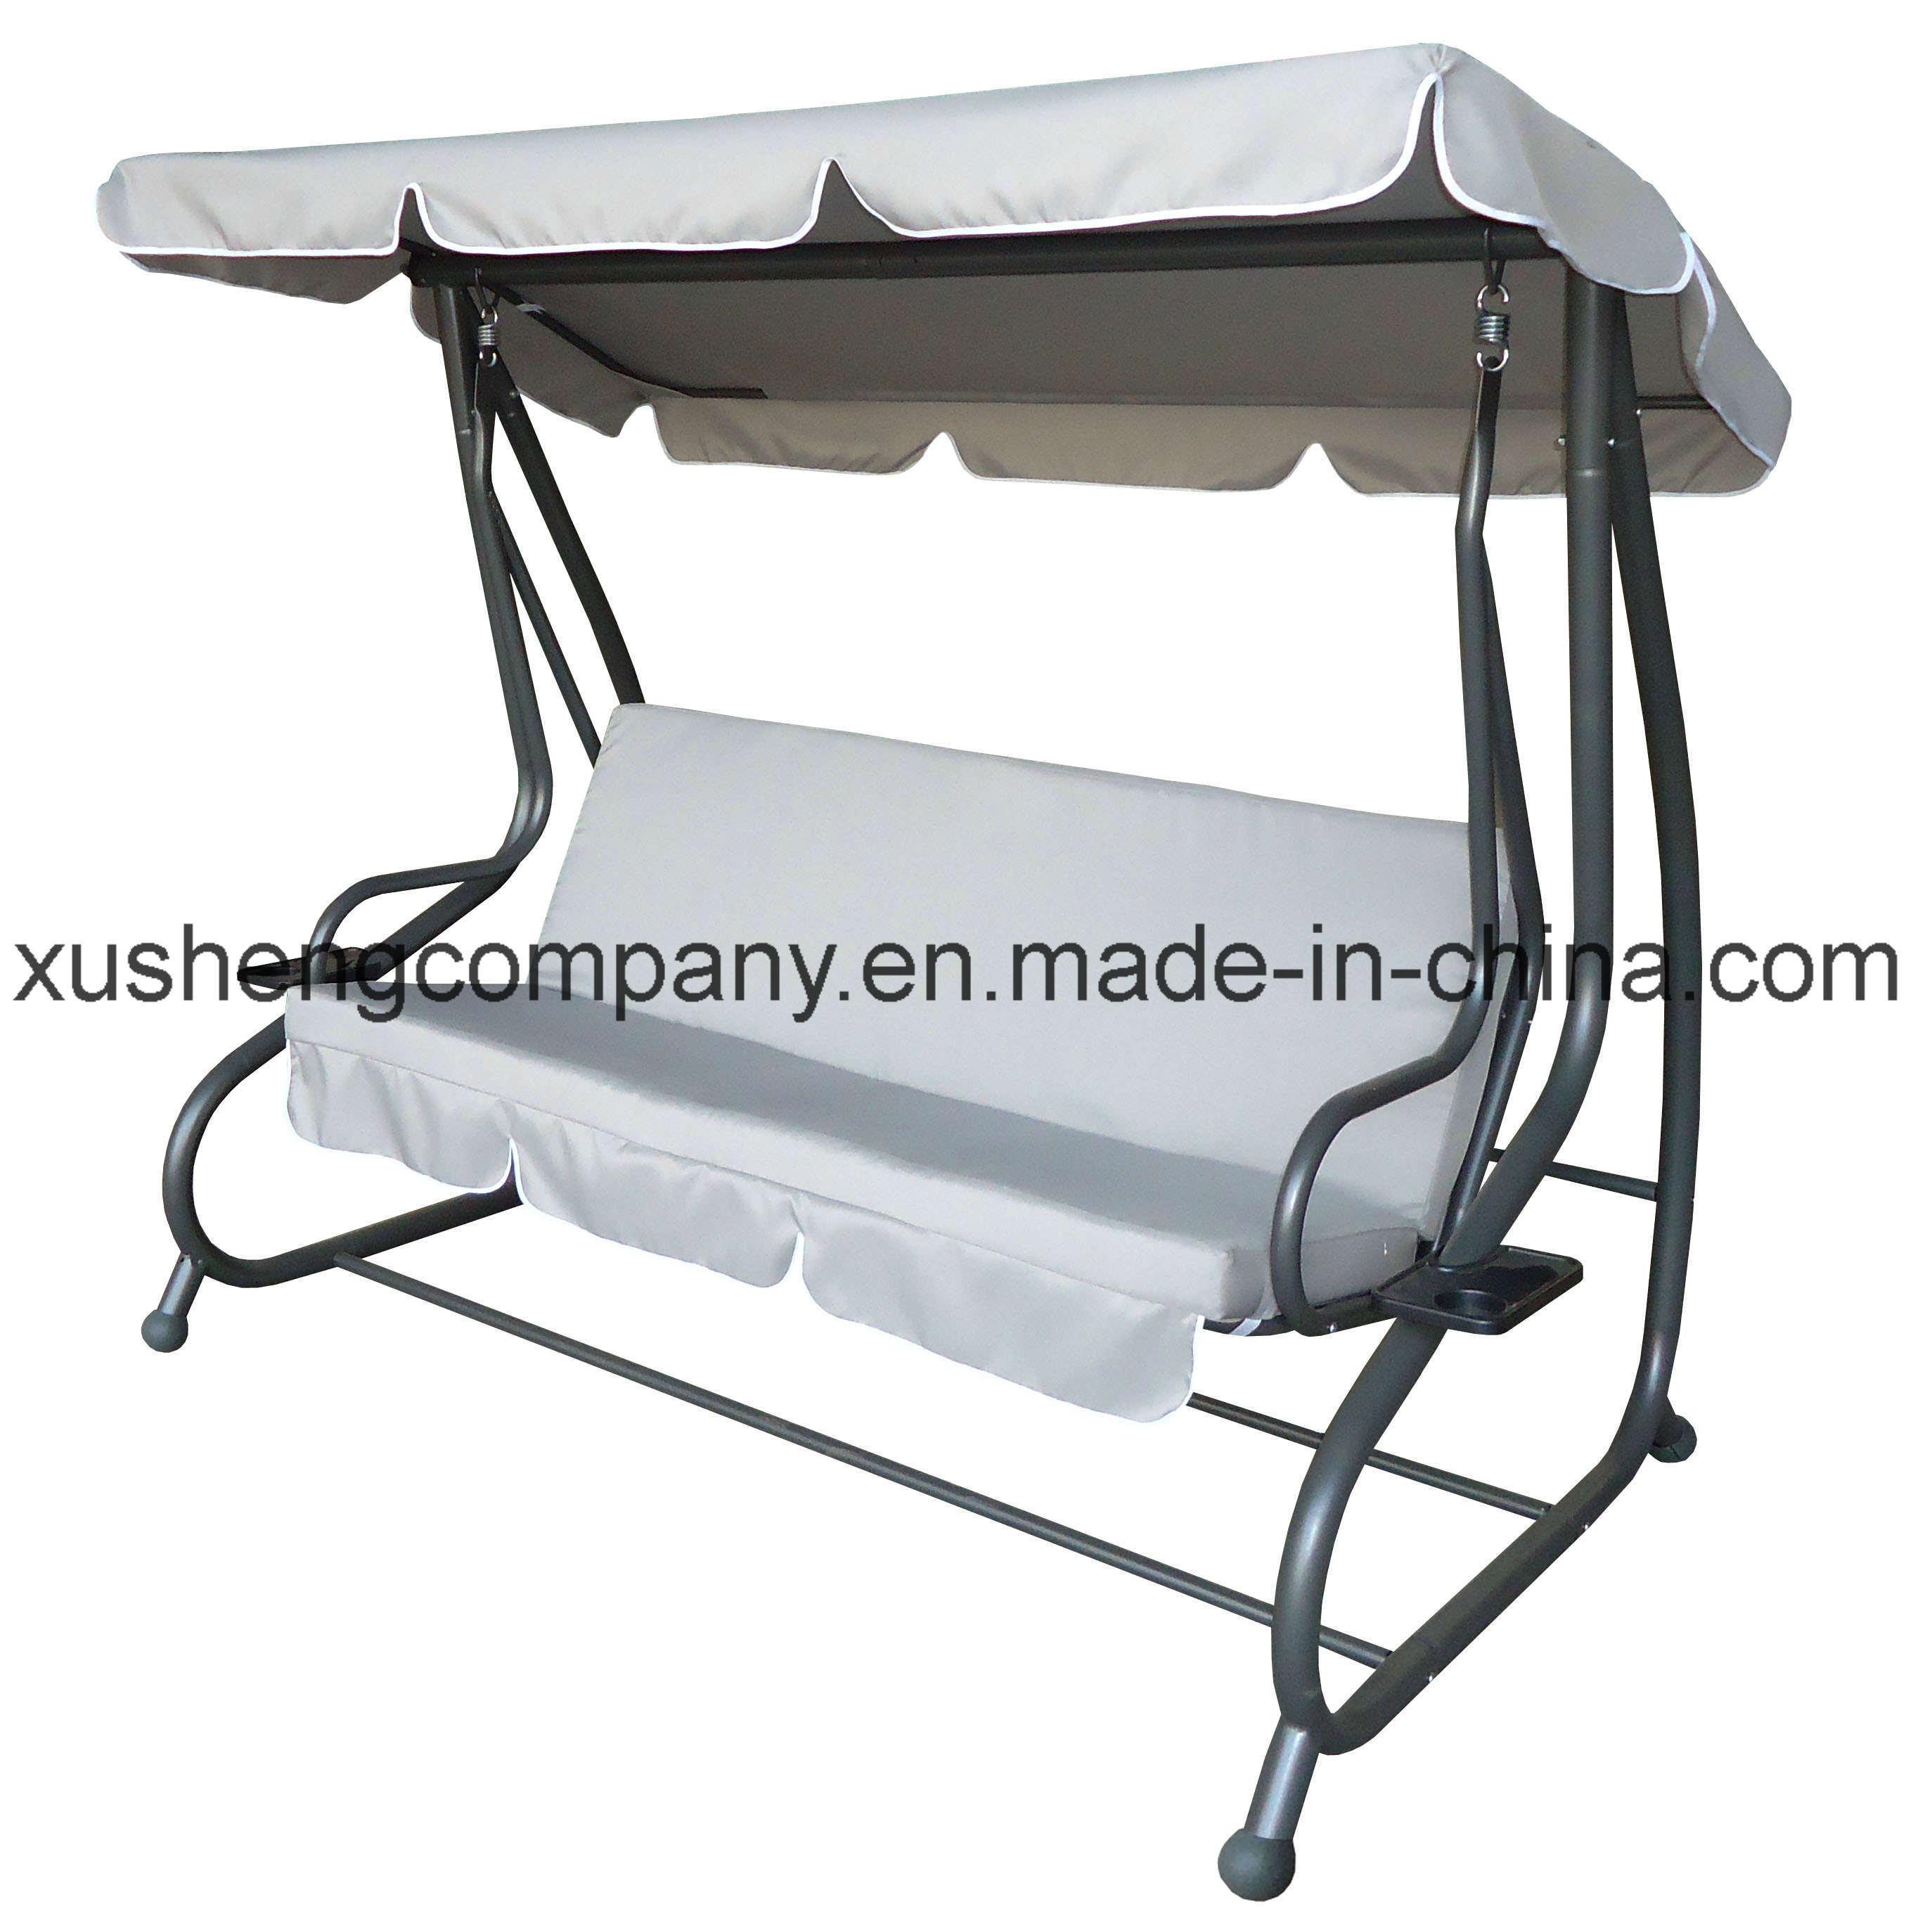 China Steel Hanging Metal Frame Garden Swing Chair China Garden